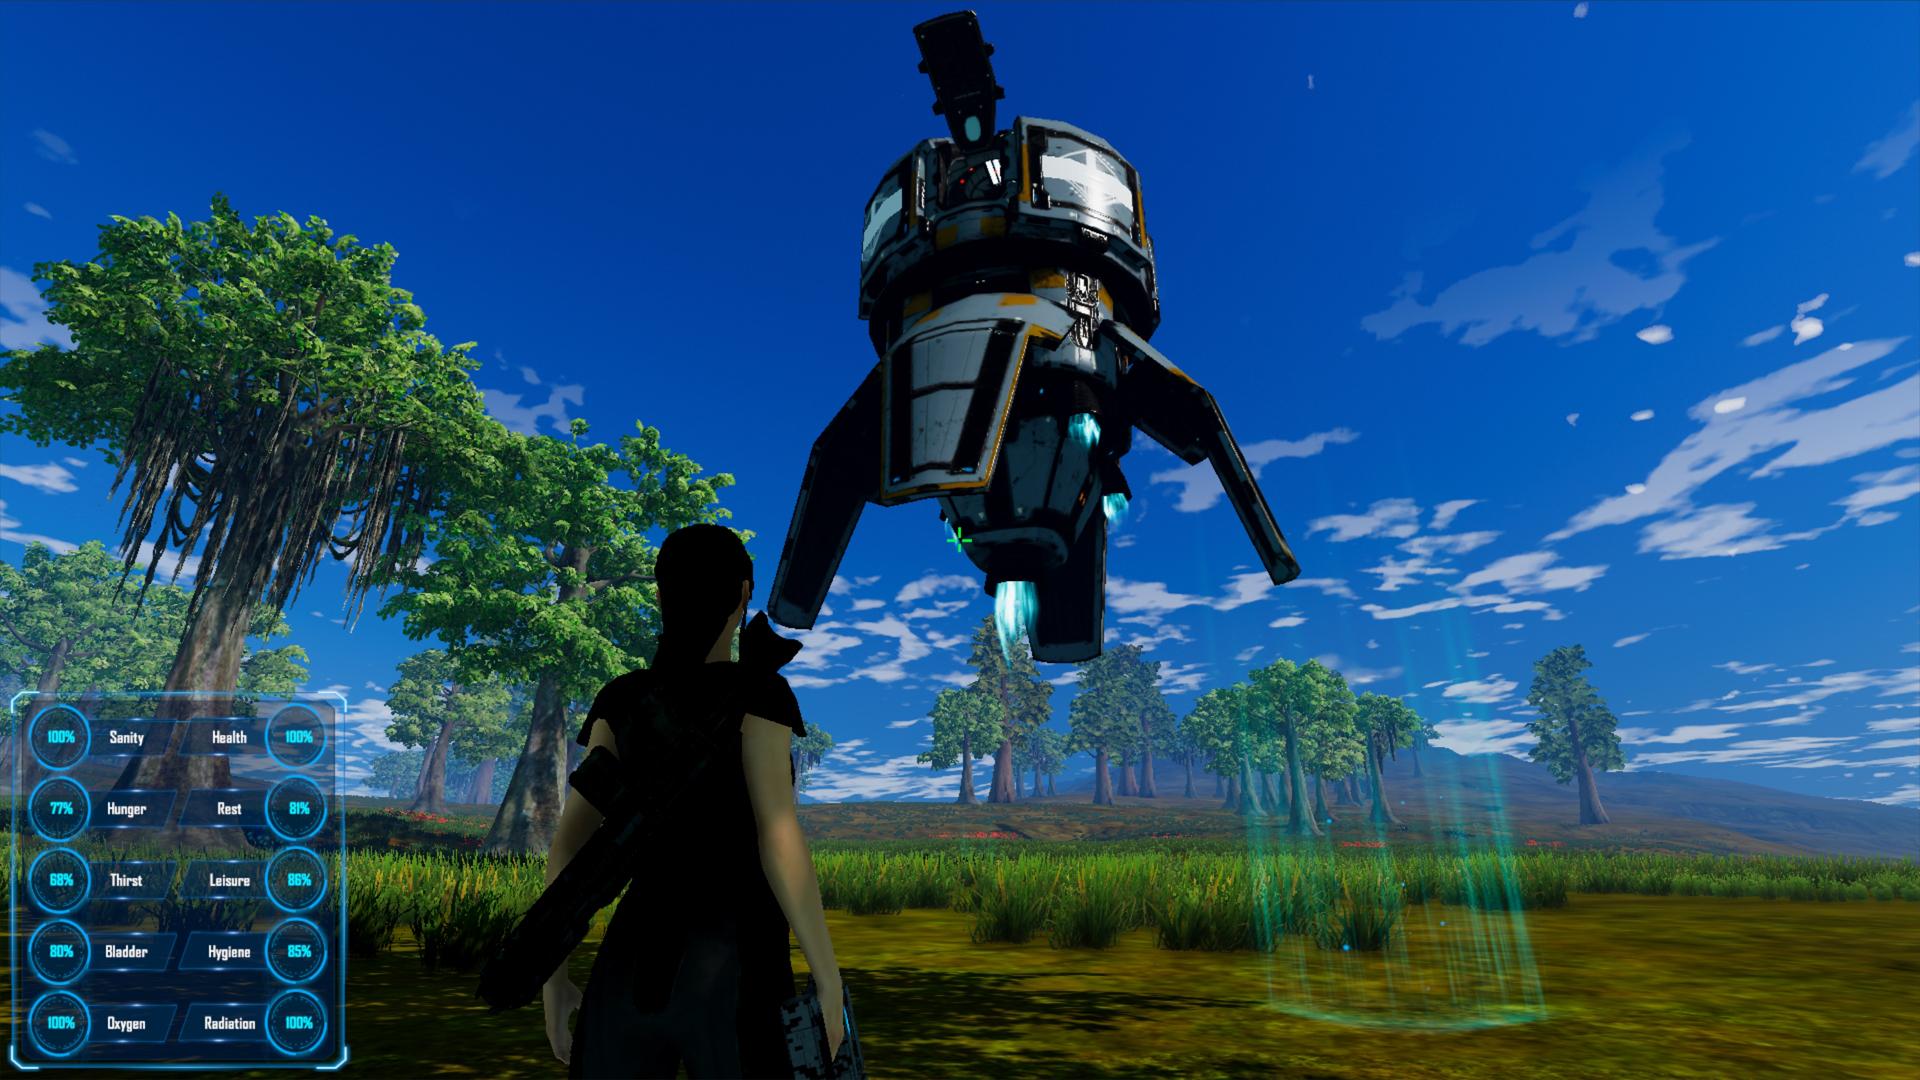 Noxs Rimworld Mod Collect — ZwiftItaly